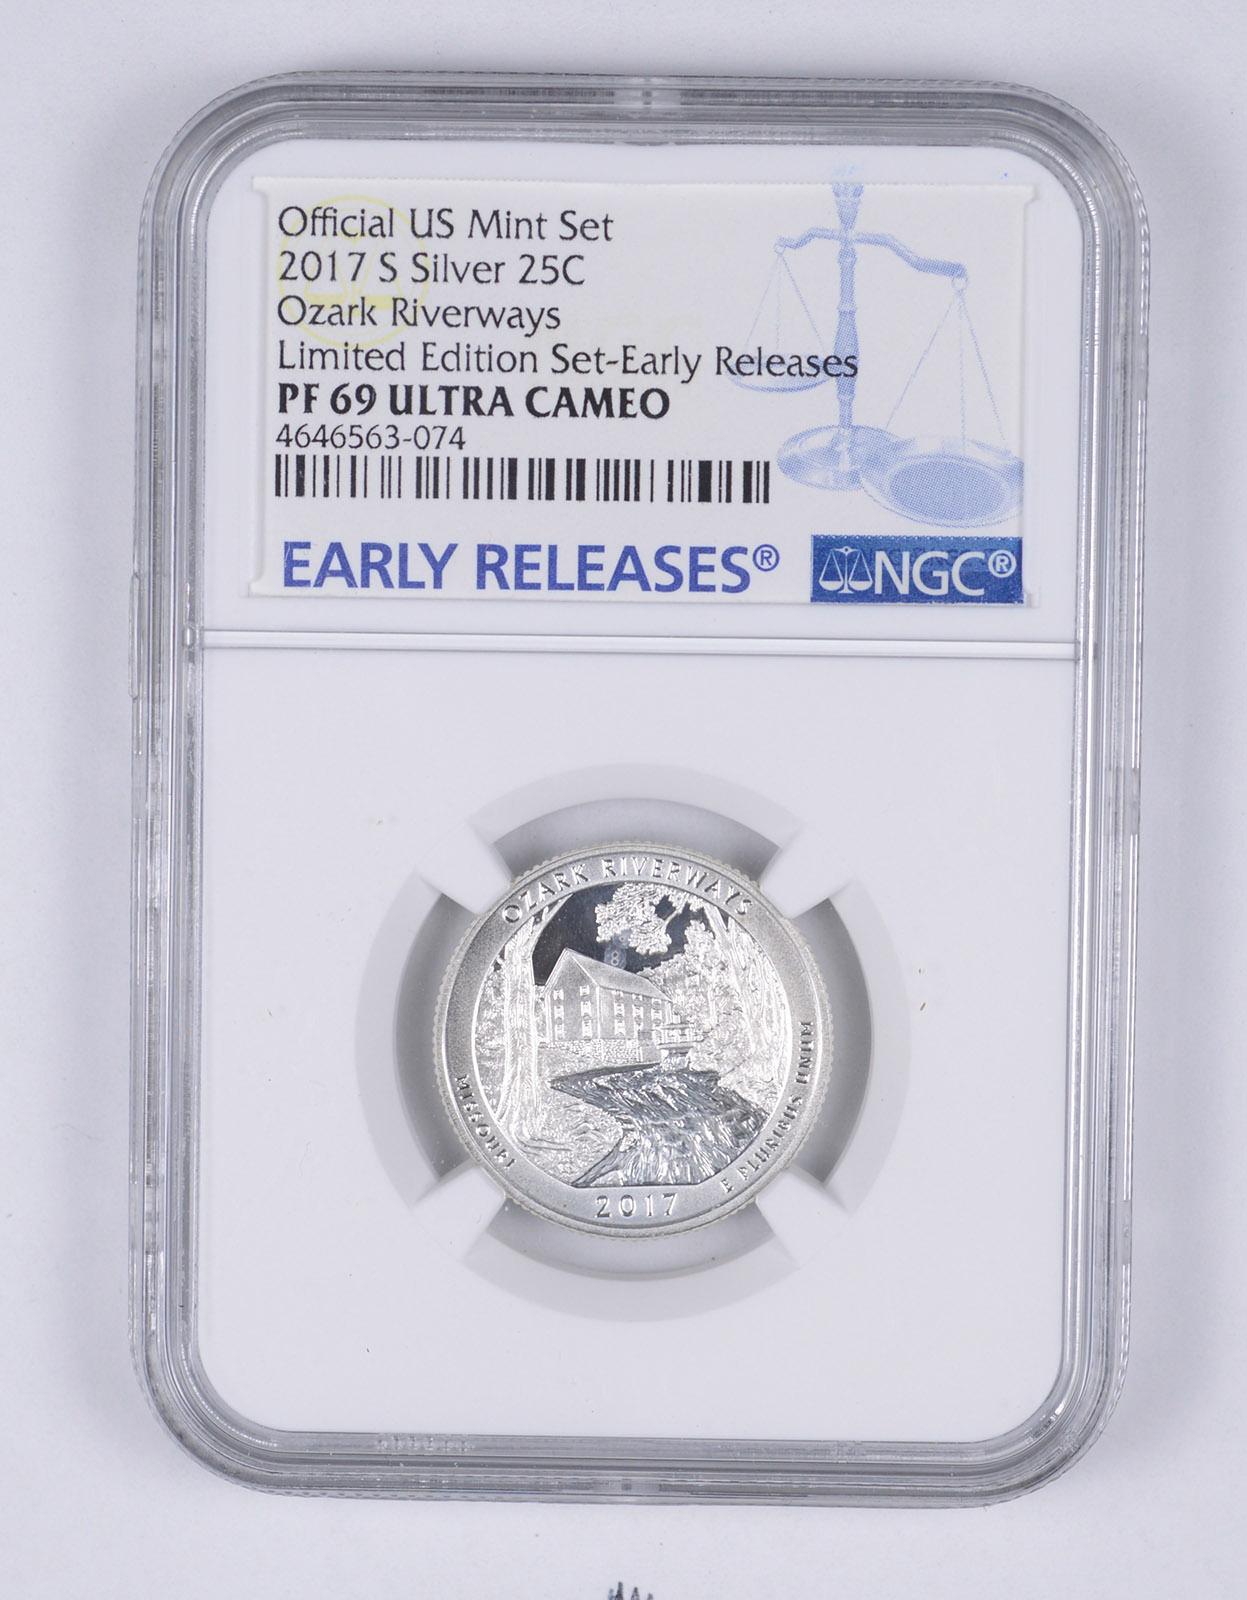 2017 S Silver Quarter Limited Edition Proof Set Ozark Riverways NGC PF69 UCAM FR